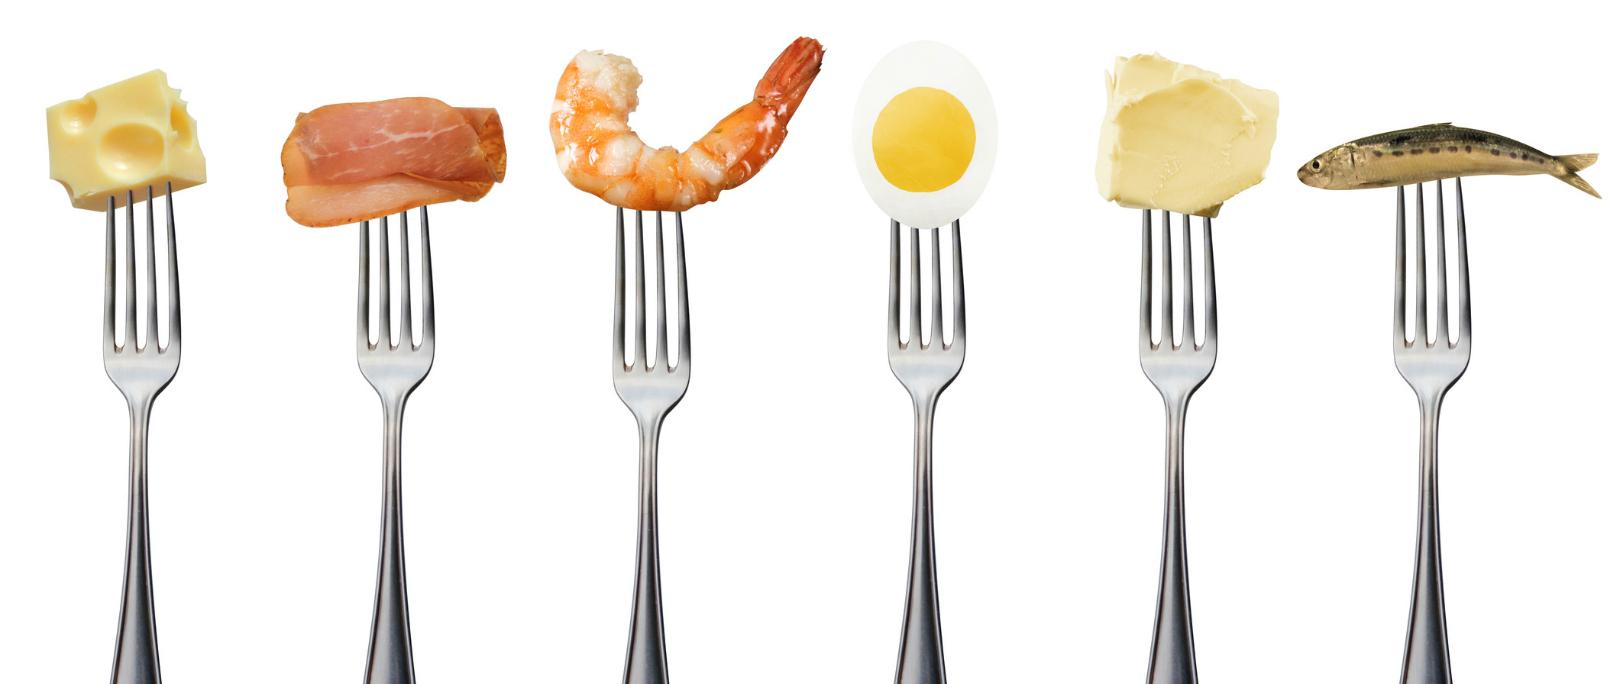 protein in blood due to diet